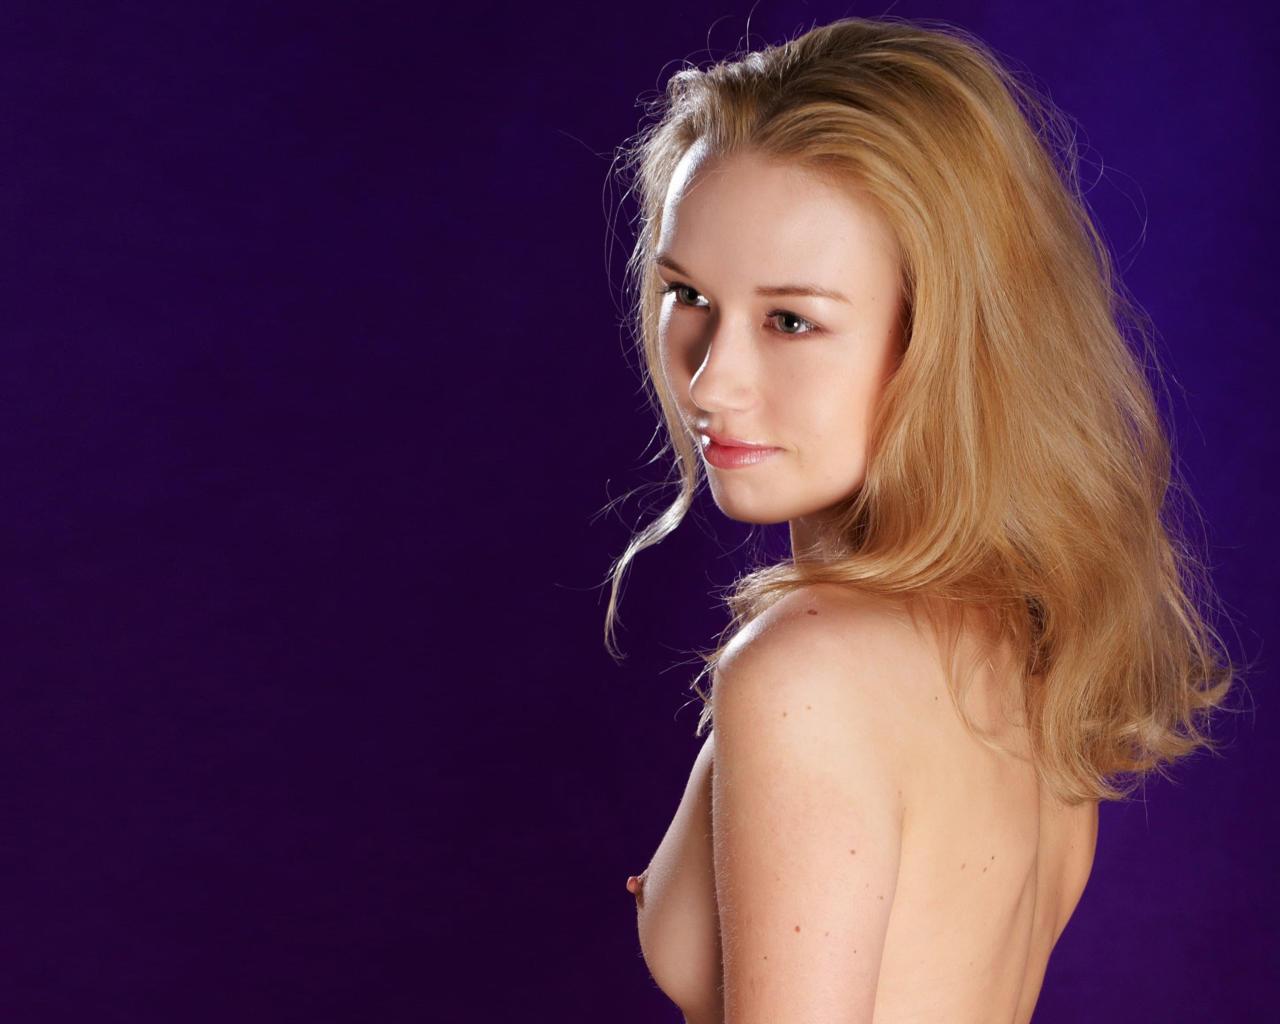 Busty British blonde Danielle Mason shows off her great